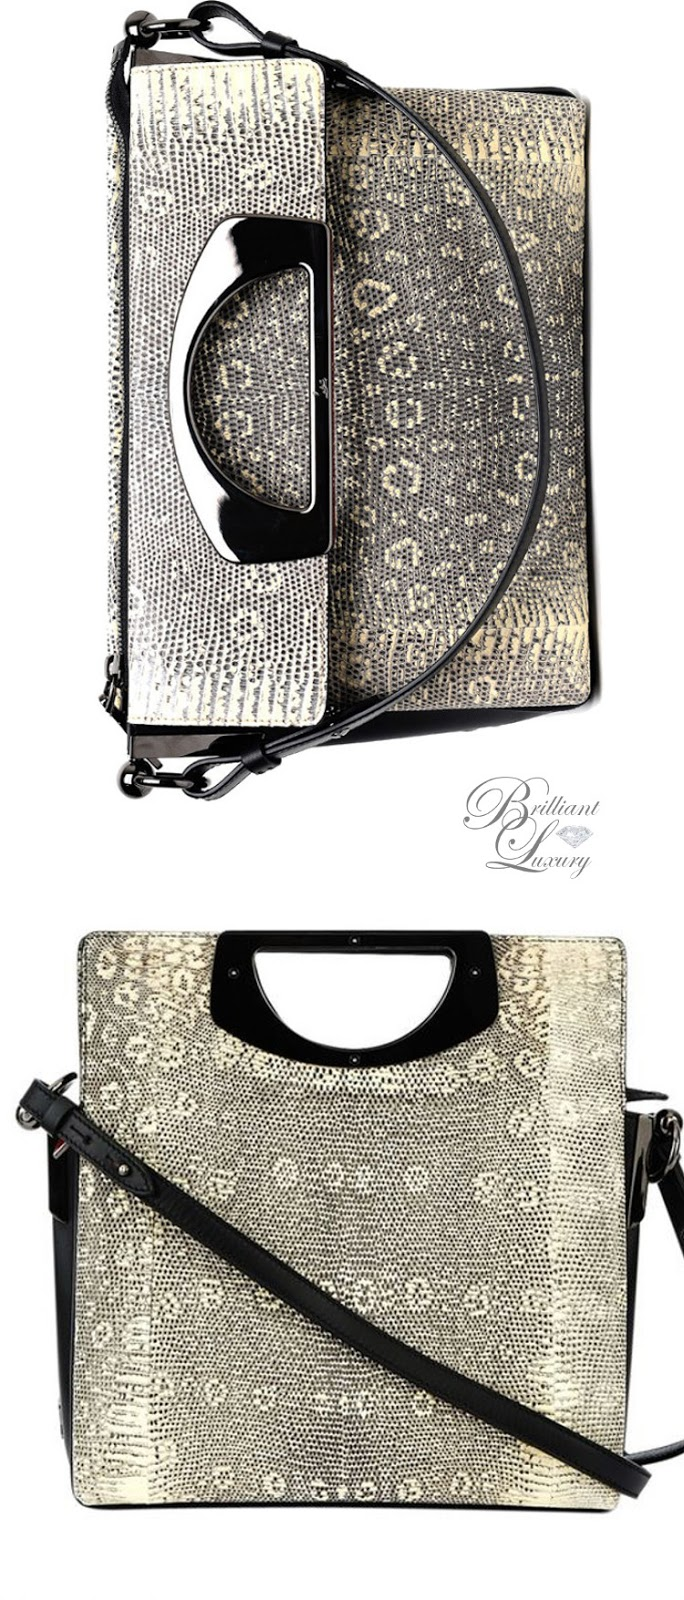 Brilliant Luxury ♦ Christian Louboutin